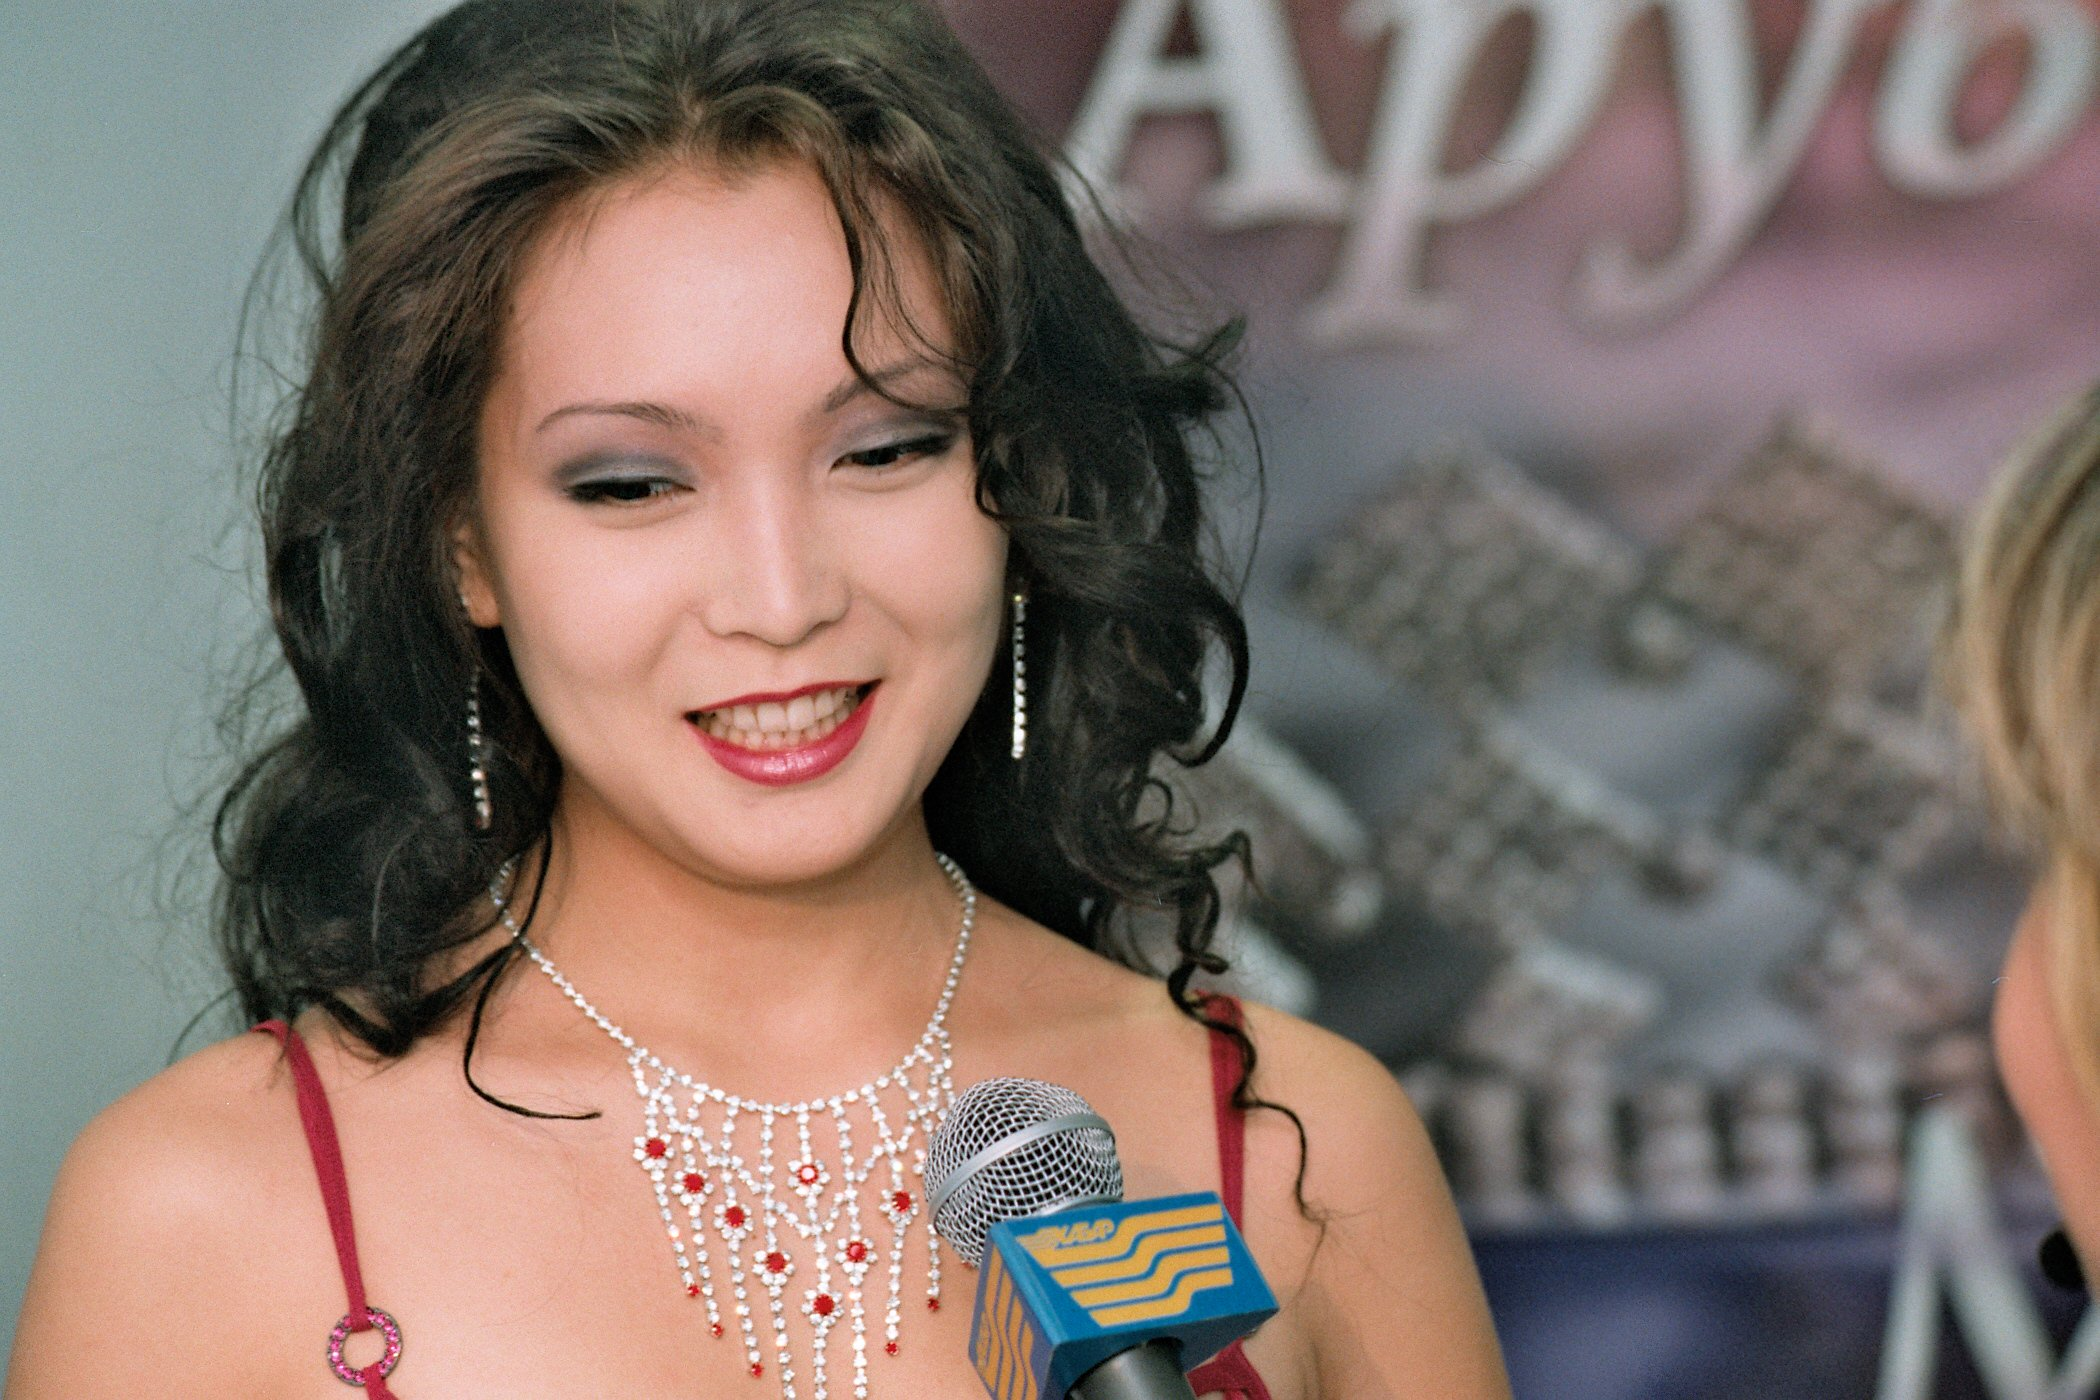 Порно компромат на начальника казахстана видео